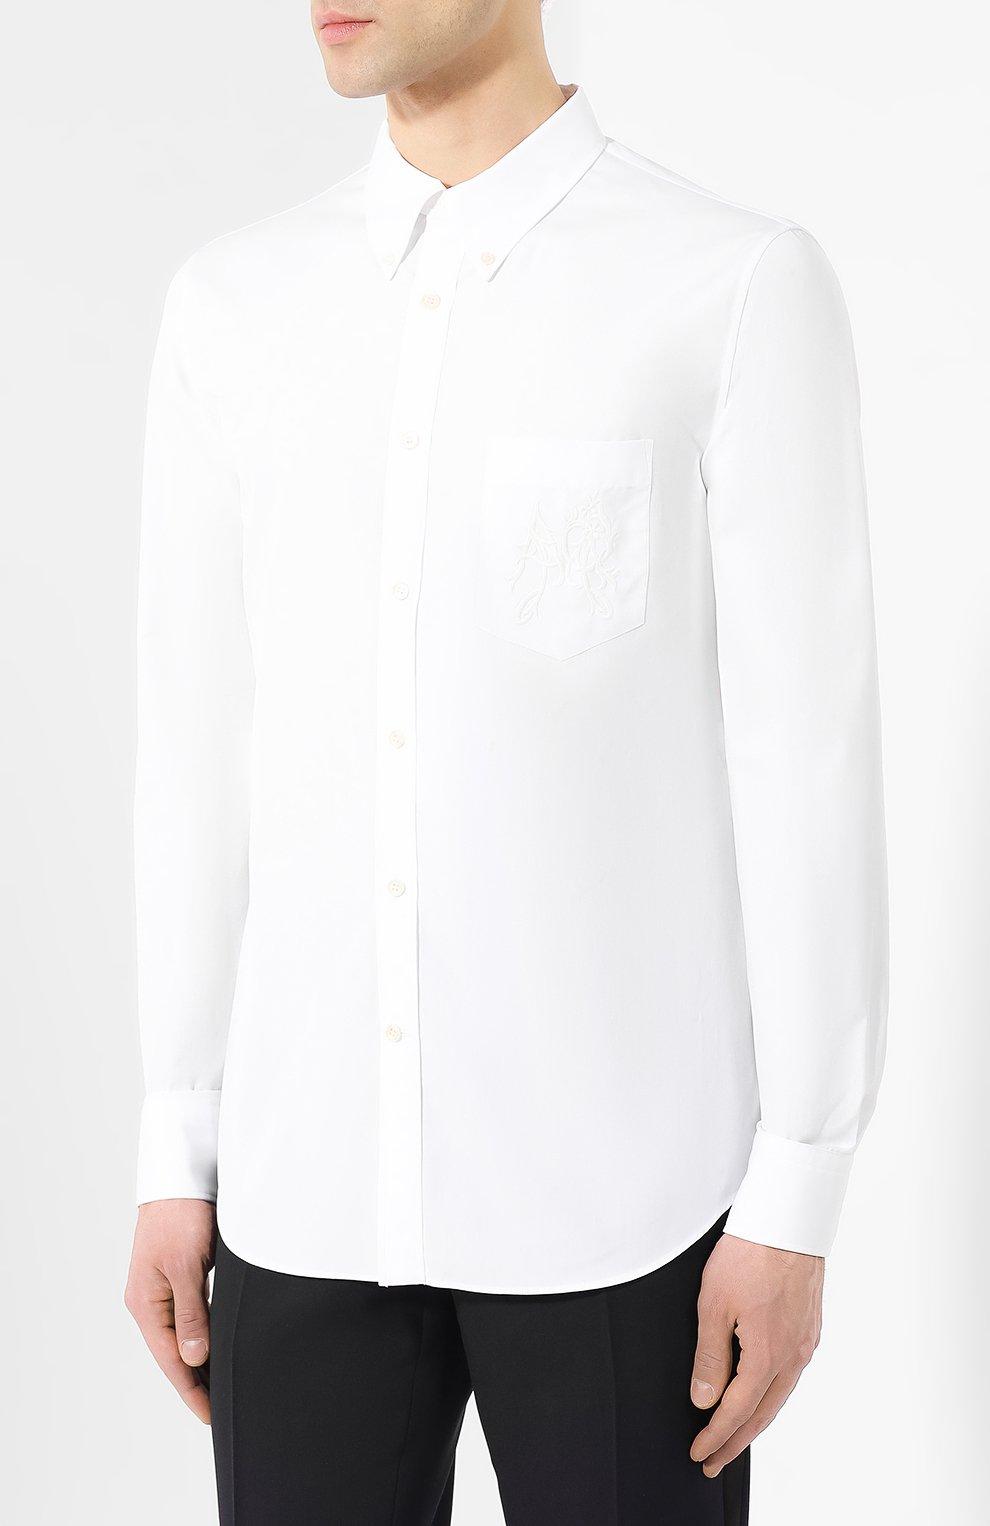 Хлопковая рубашка с воротником button down | Фото №3